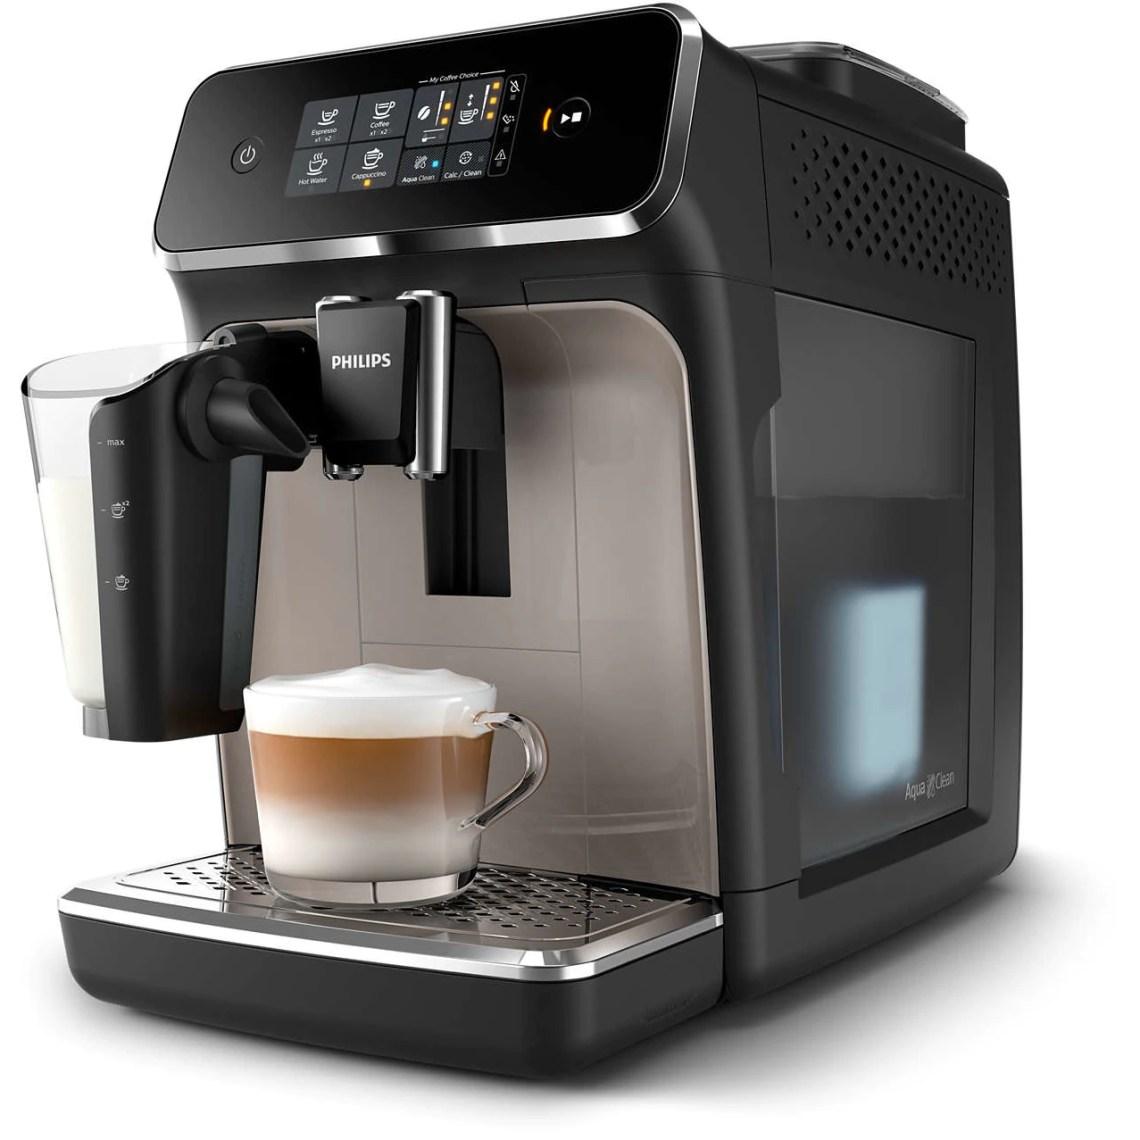 Espressor automat Philips EP2235/40, 12 setari de macinare, 15 bar, 3 setari pentru intensitate, 3 tipuri de bauturi , Filtru AquaClean, Ecran tactil, Argintiu/Negru